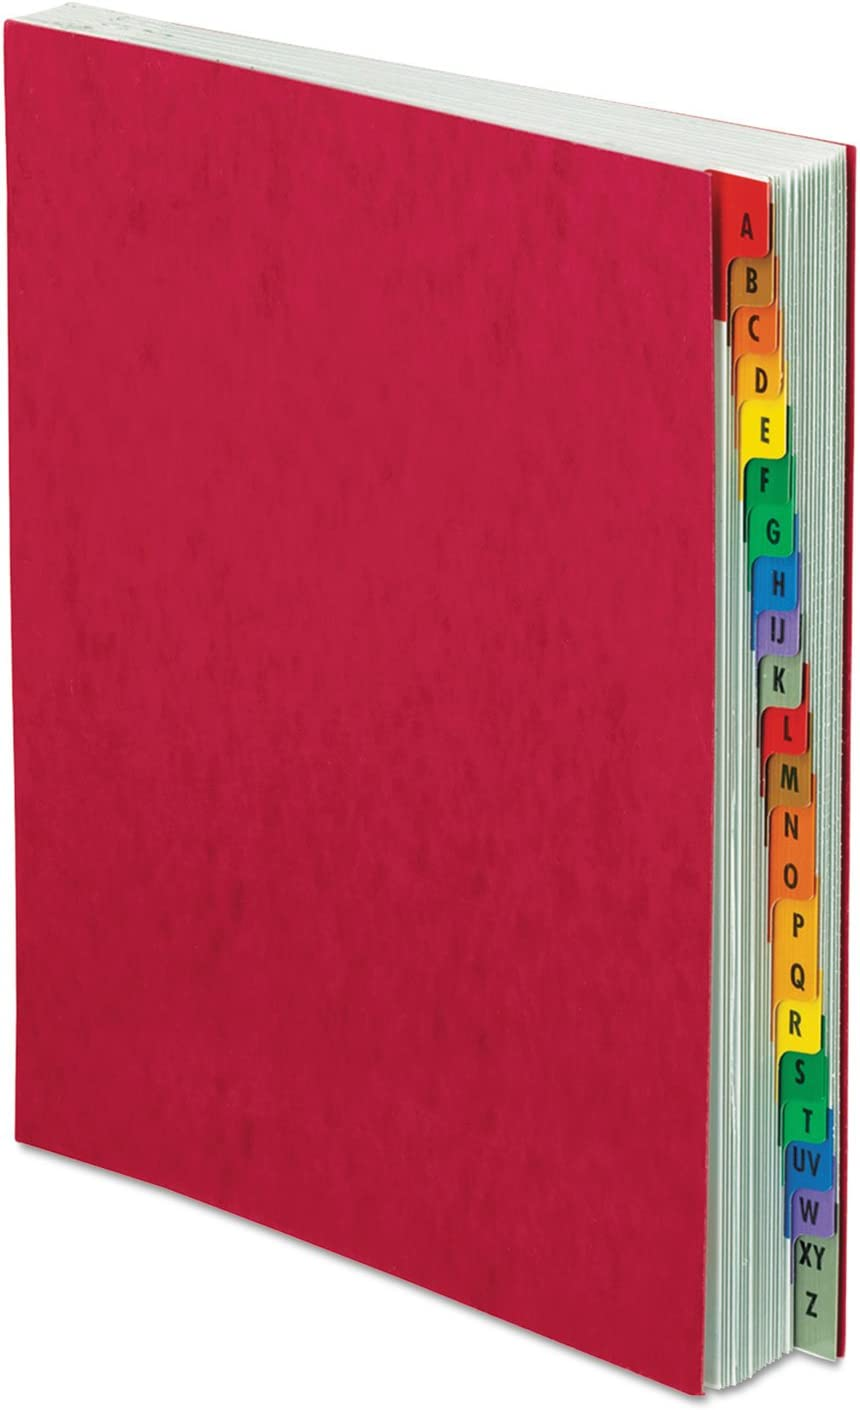 Red Pressboard Cover Pendaflex 11017 A-Z Expanding Desk File Letter Size